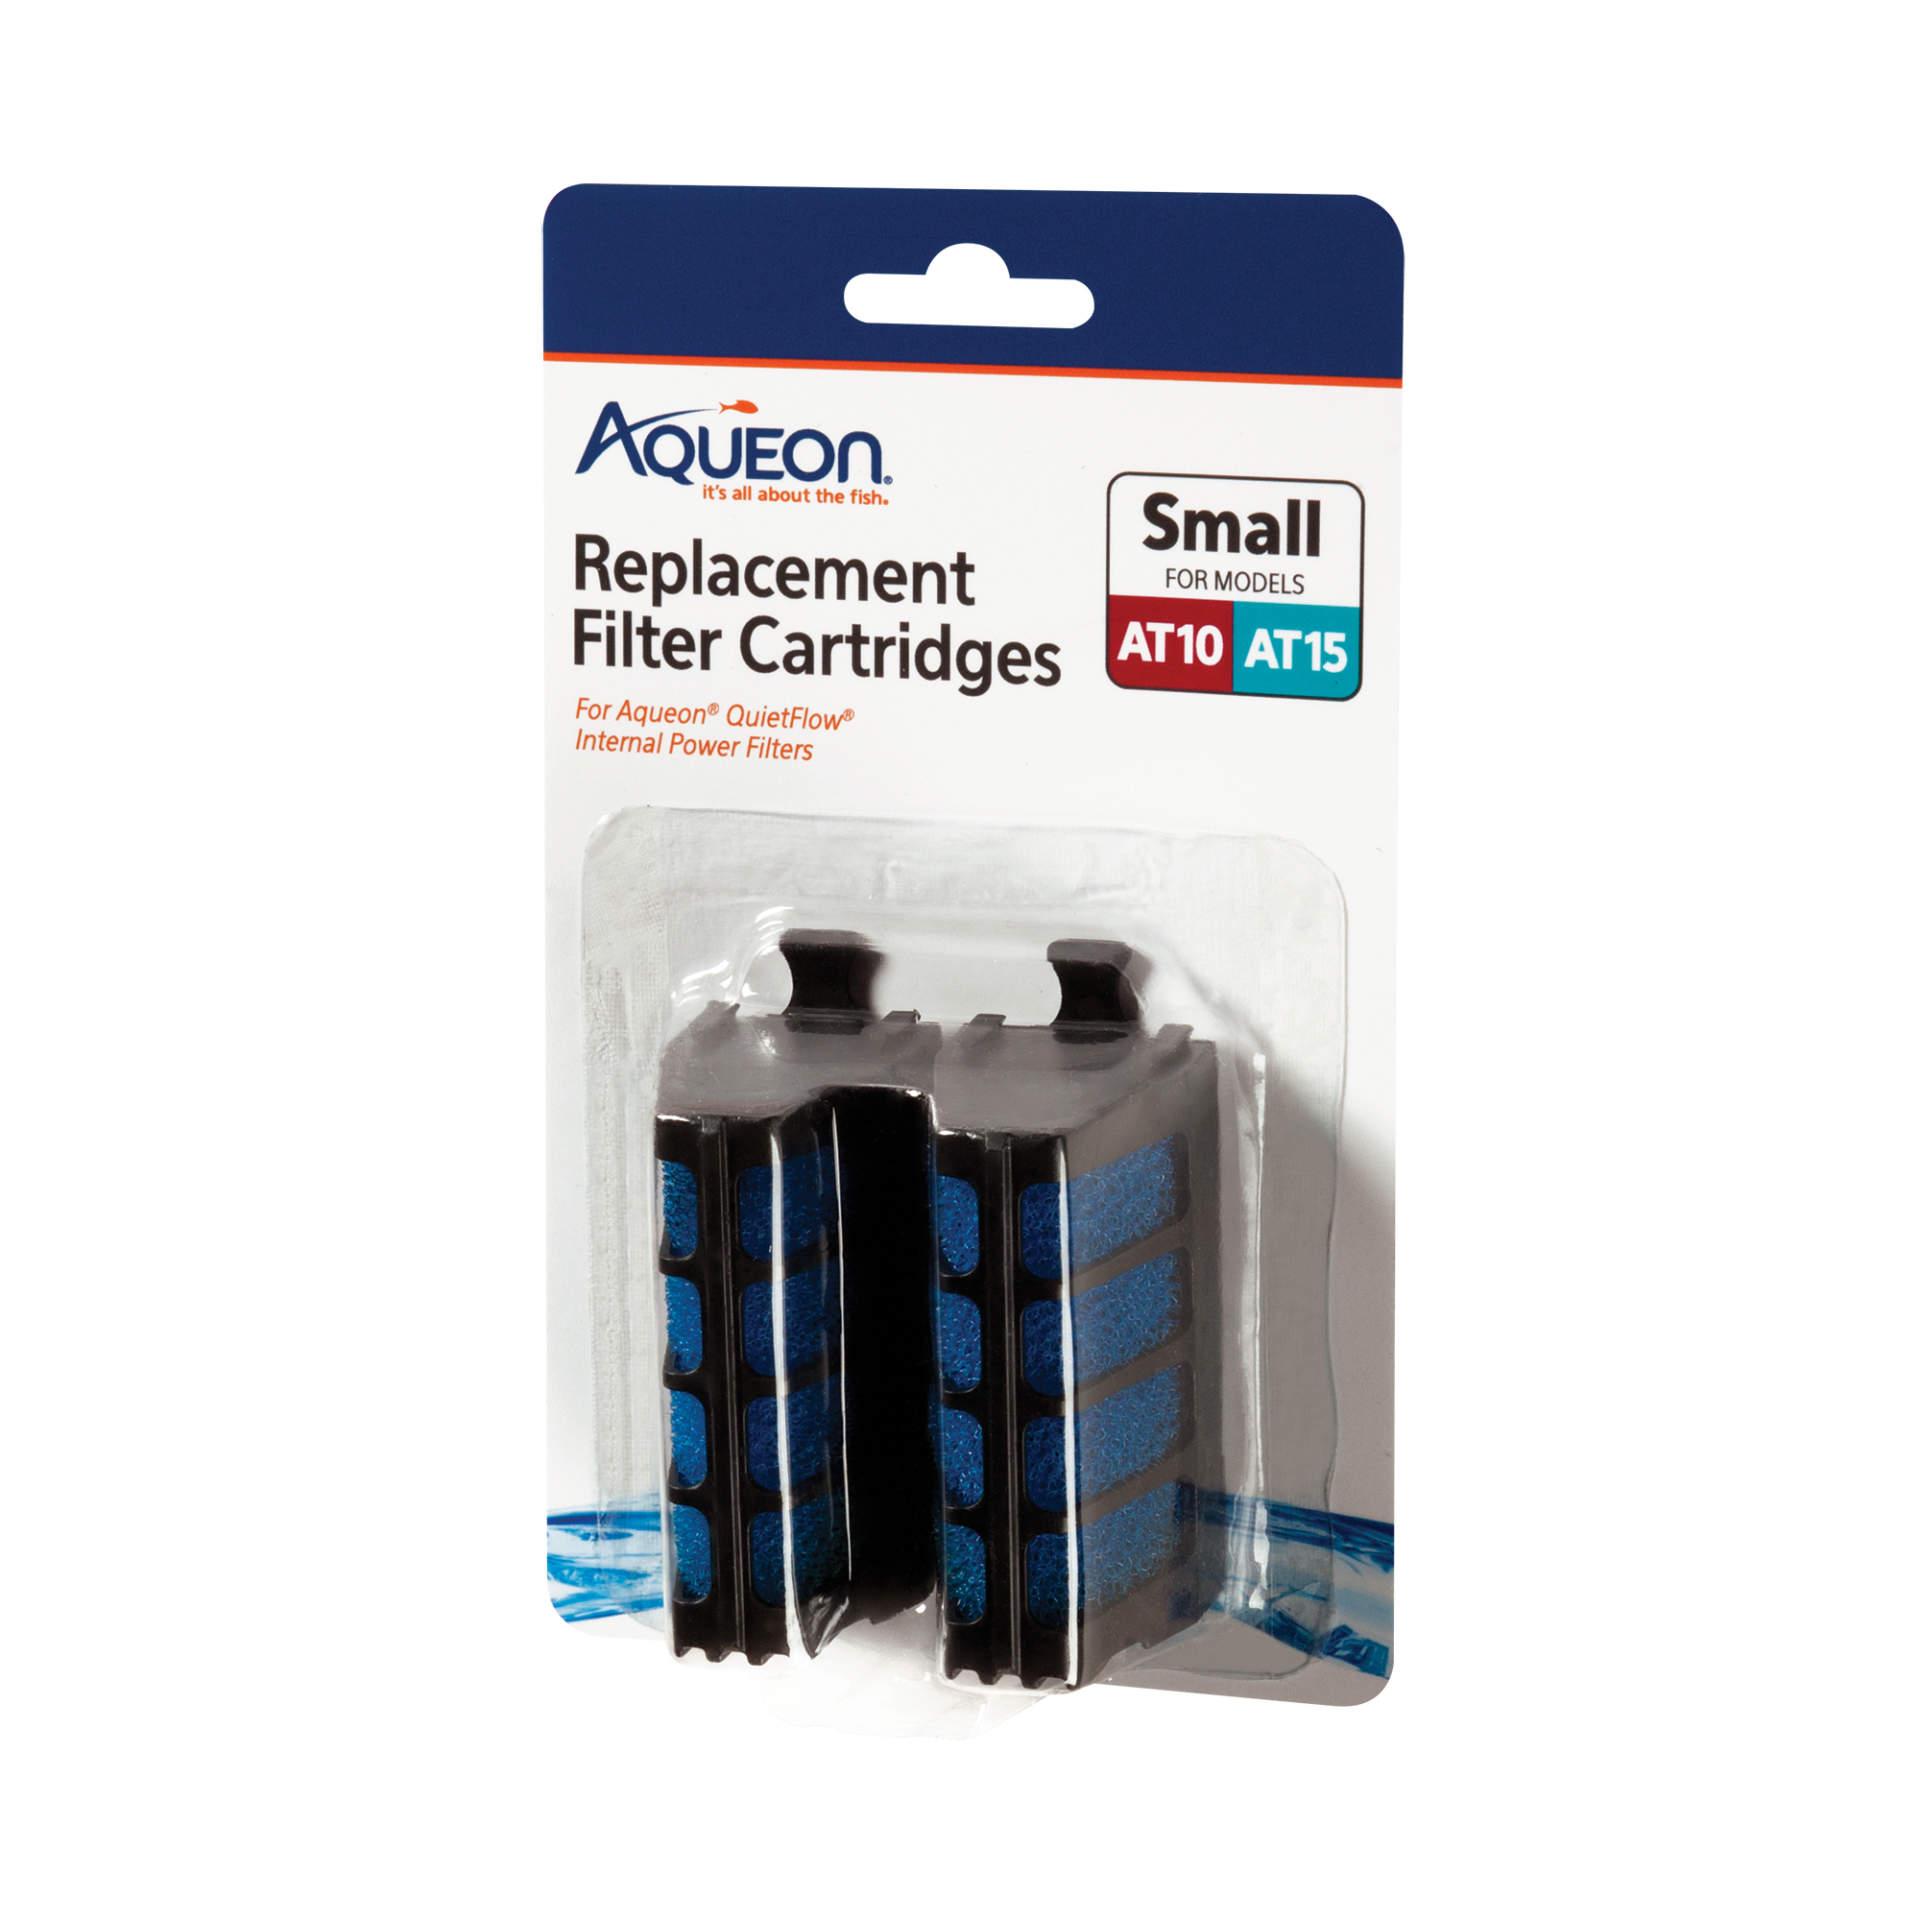 Aqueon Replacement Internal Filter Cartridges, Small